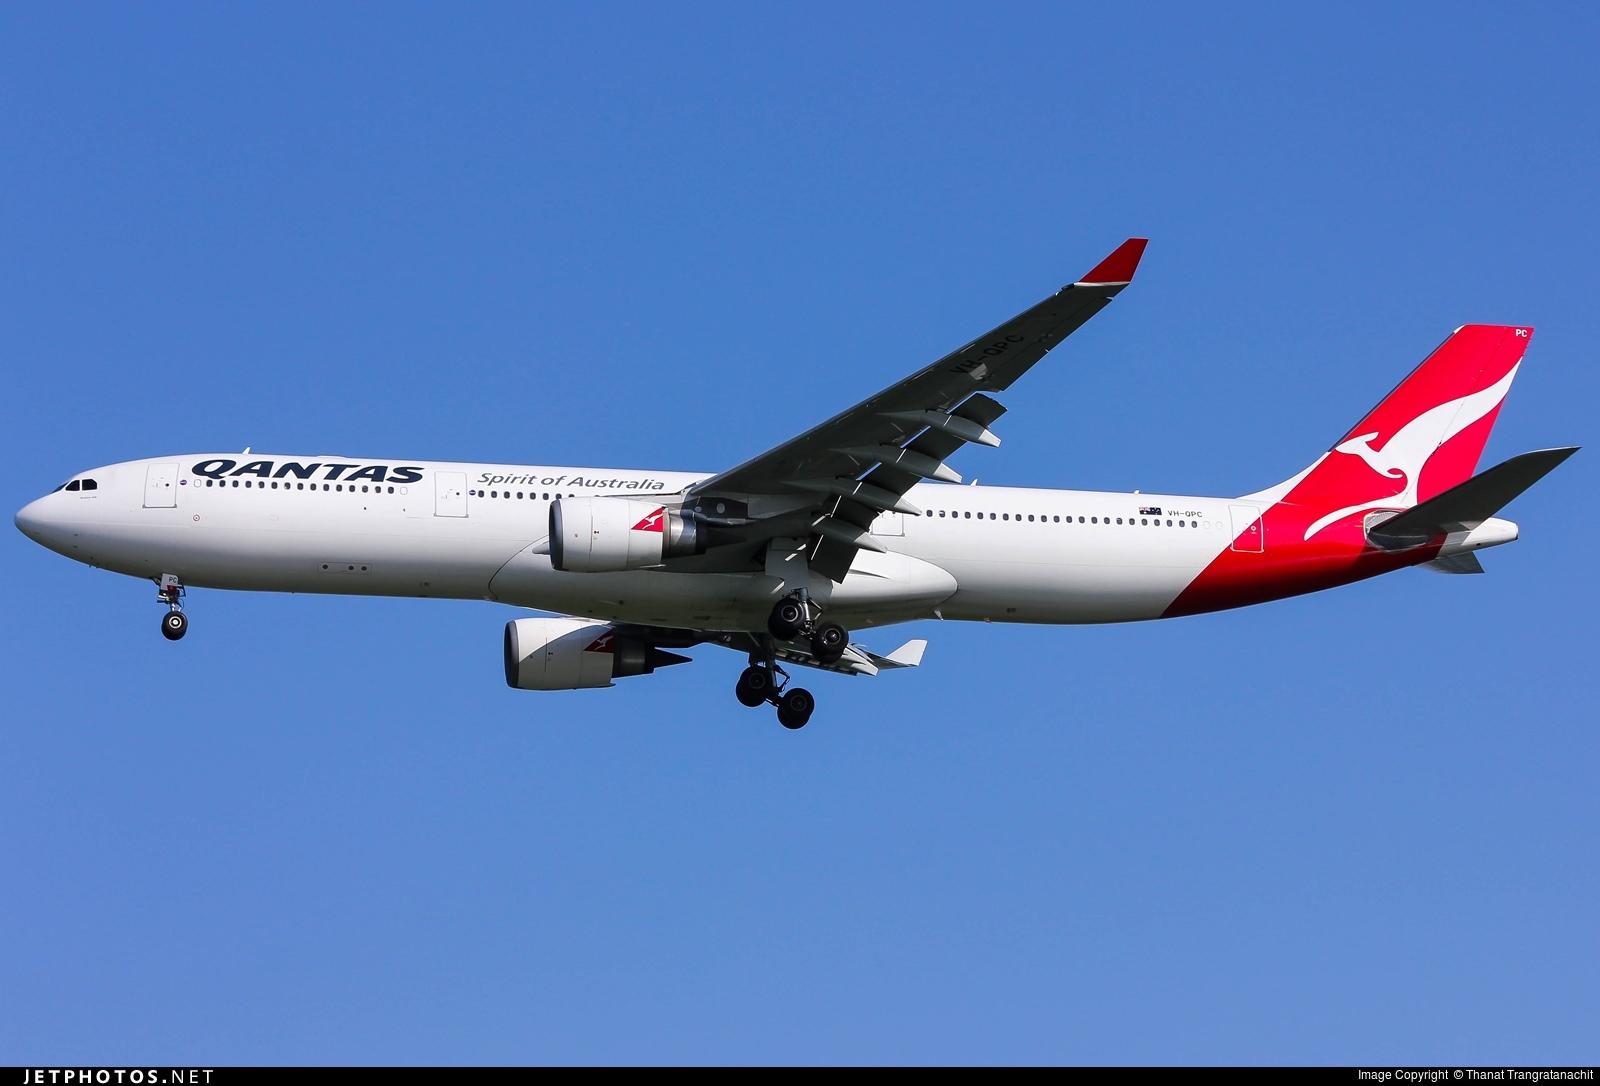 Photo of VH-QPC Airbus A330-303 by Thanat Trangratanachit